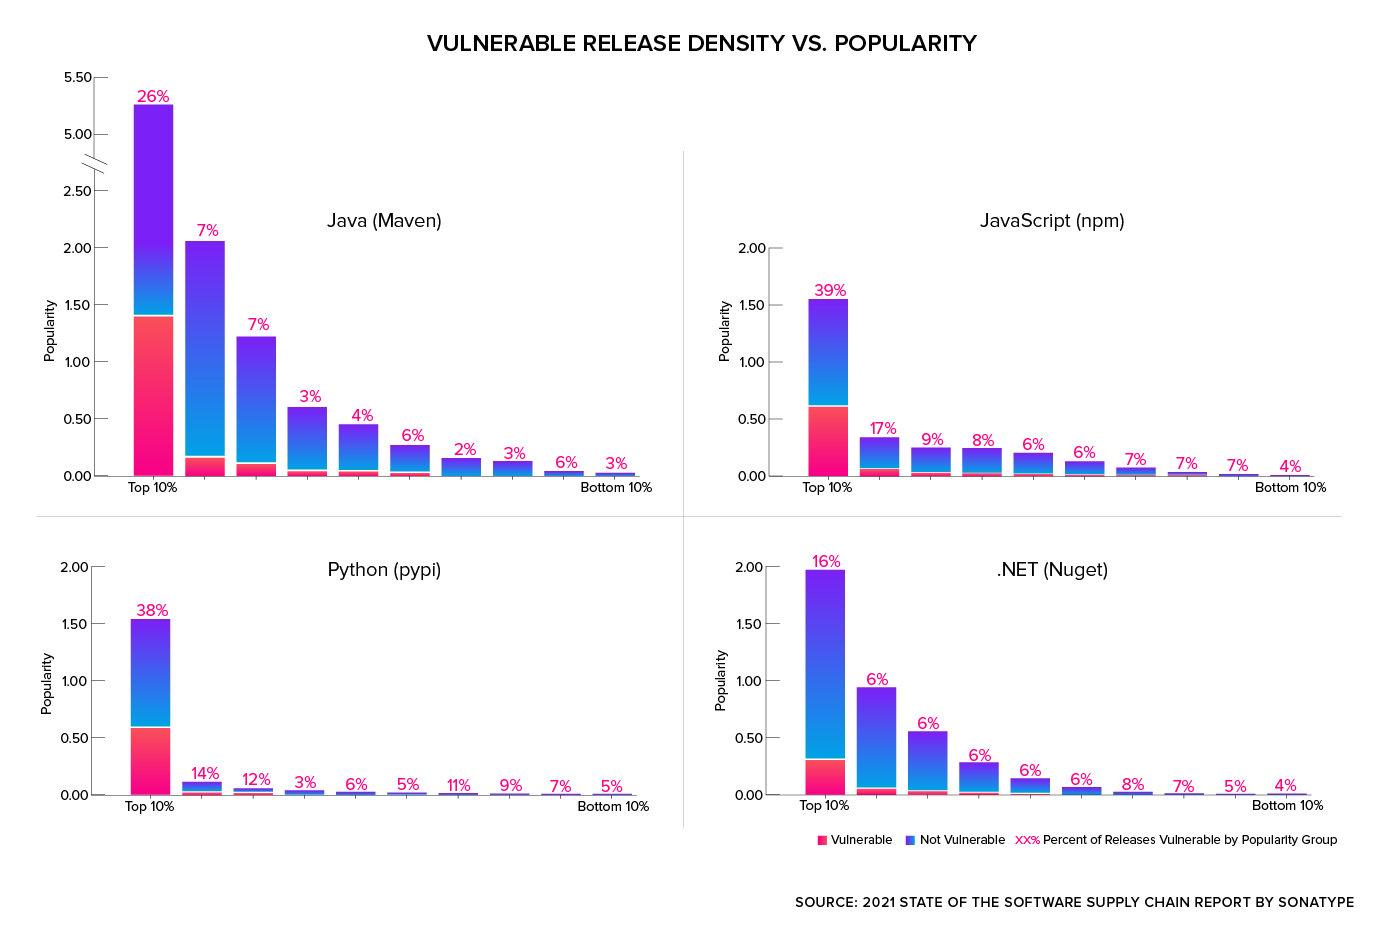 Open source vulnerability density by ecosystem